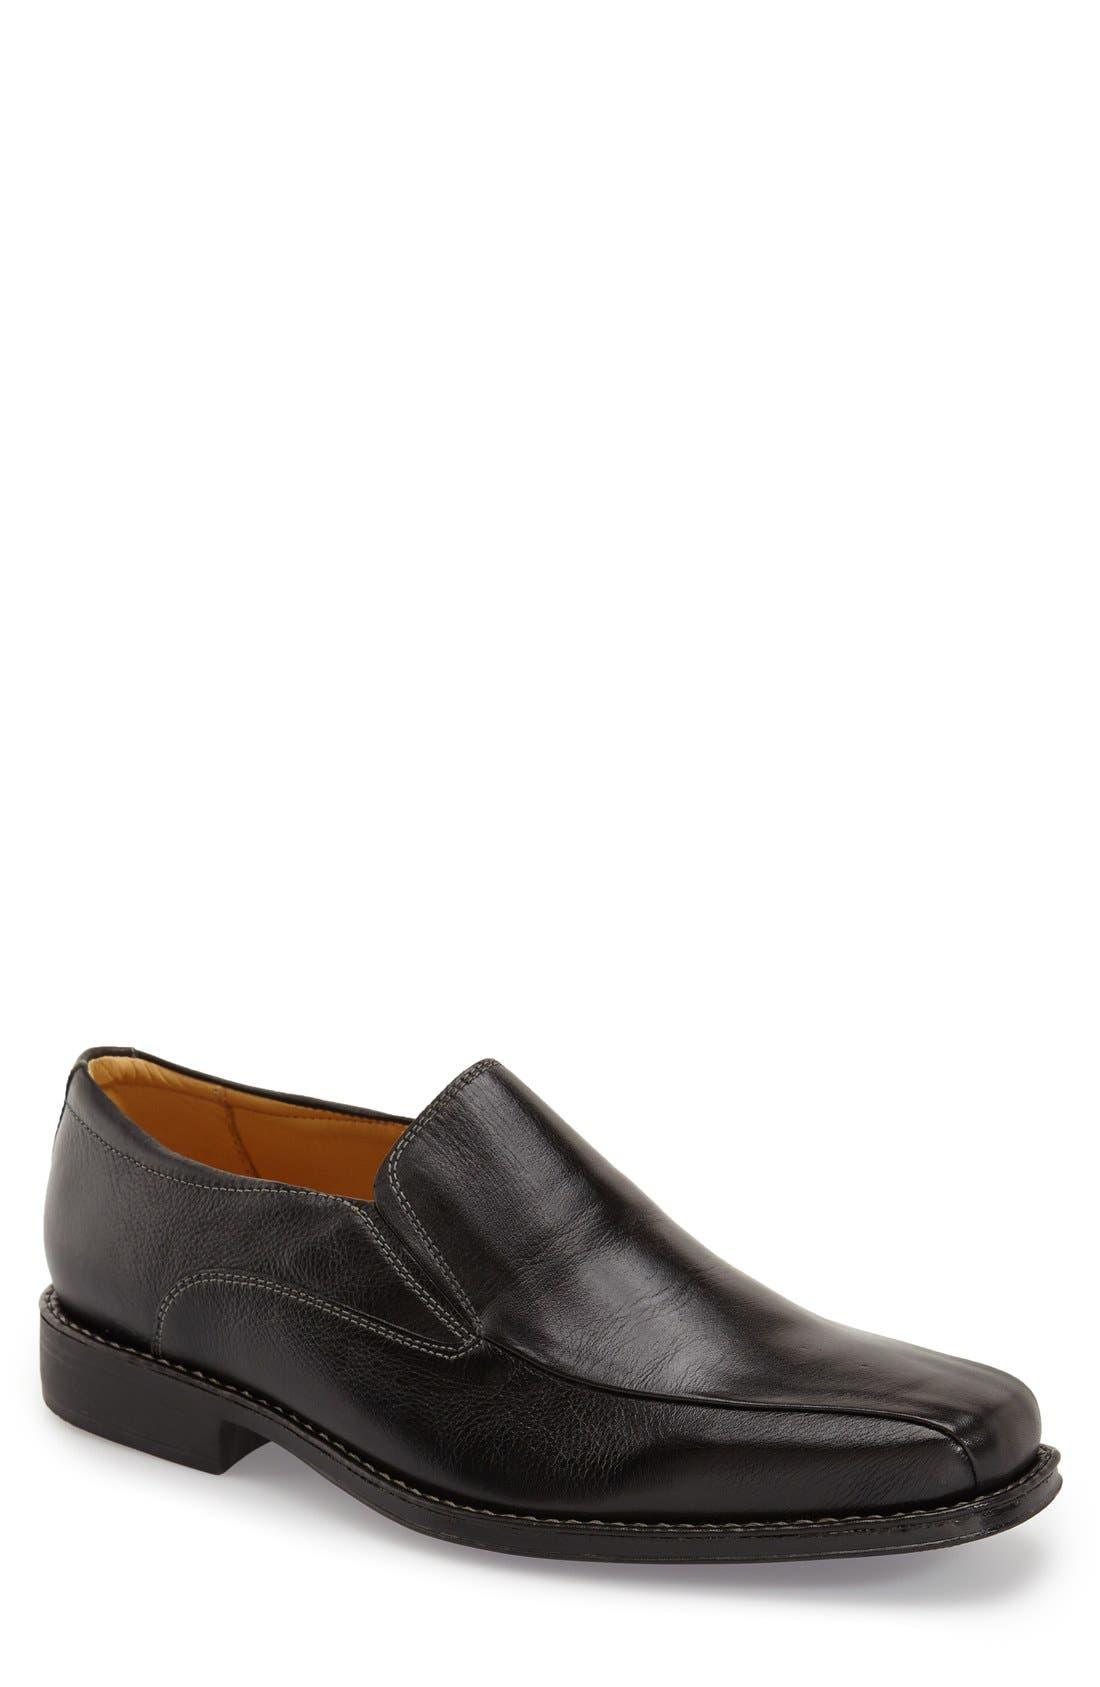 'Jacobs Venetian' Slip-On,                         Main,                         color, BLACK/ BLACK